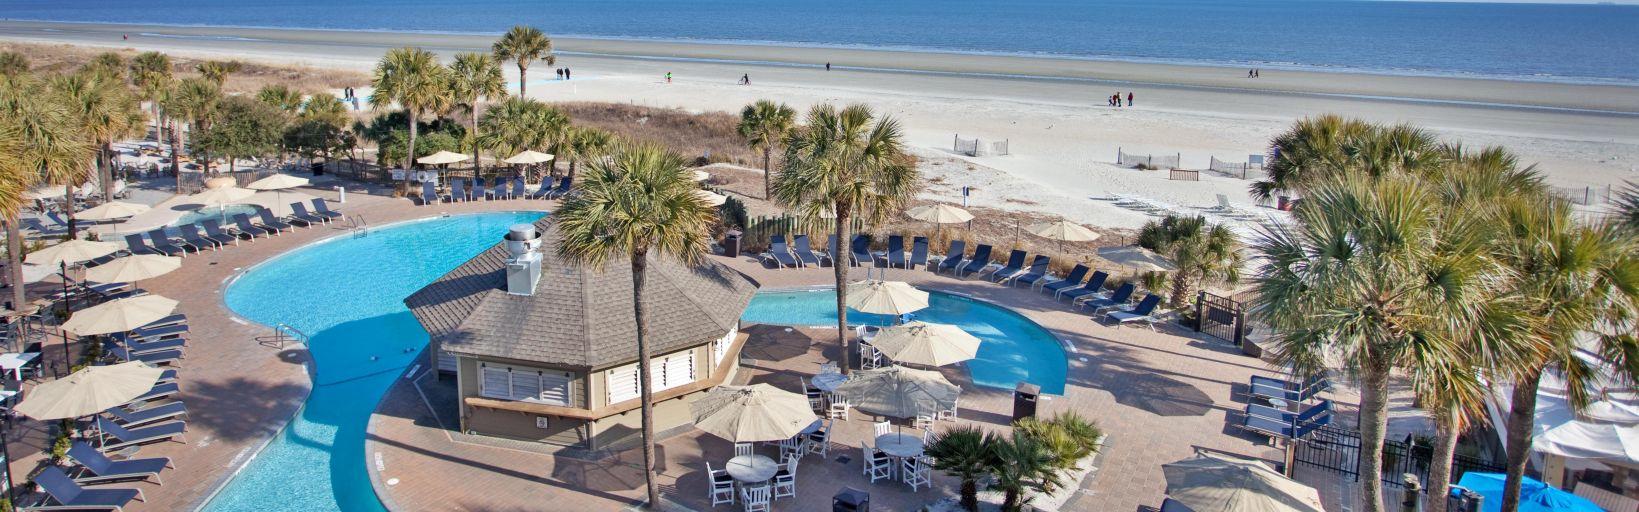 hilton head resorts - holiday inn resort beach house hotel